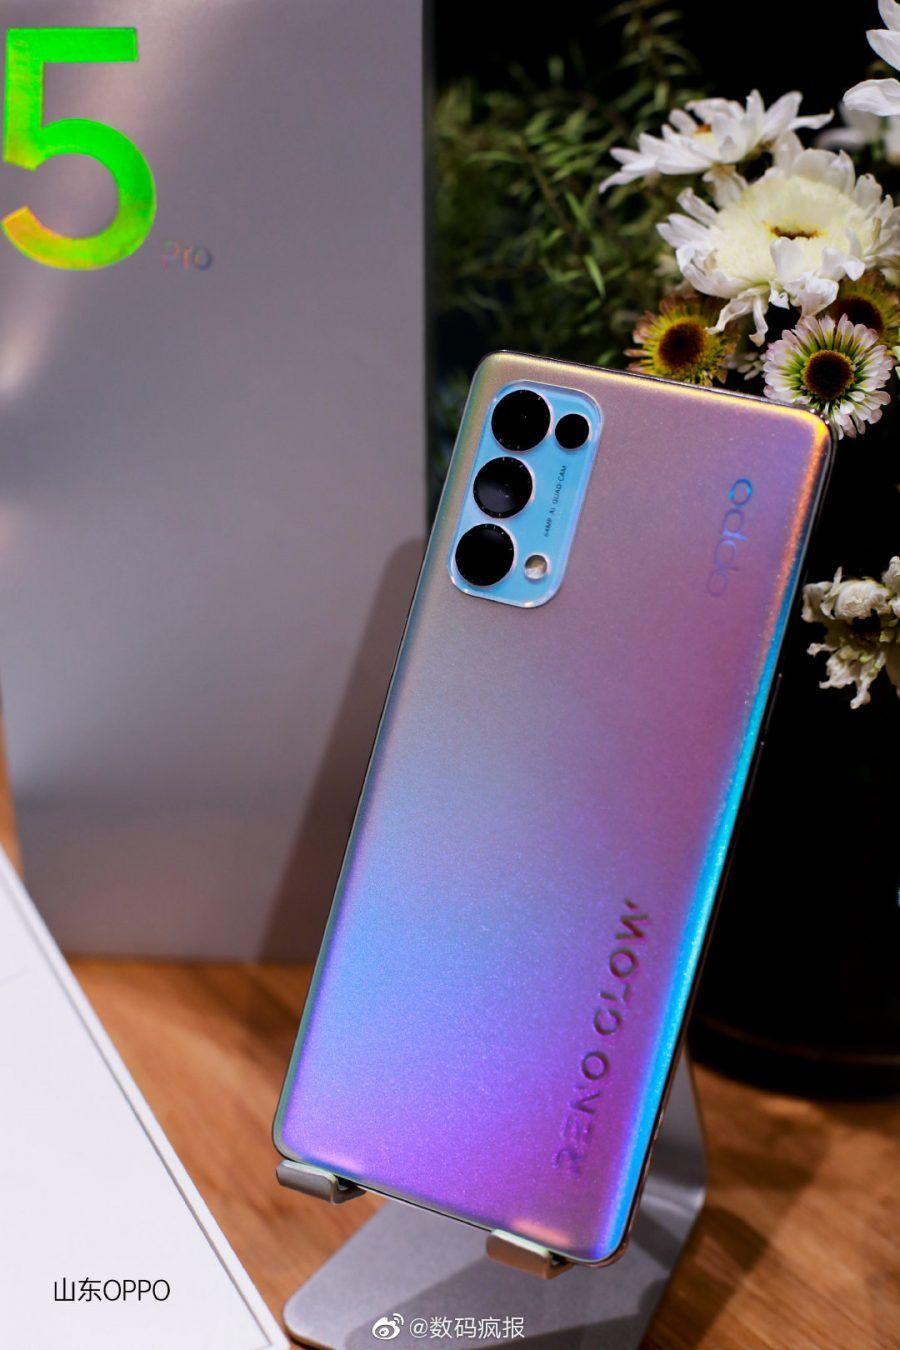 Reno5Pro 8 Android 11, china, gama-média, imagens reais, oppo, OPPO Reno 5, Reno 5 Pro, smartphone, topo de gama